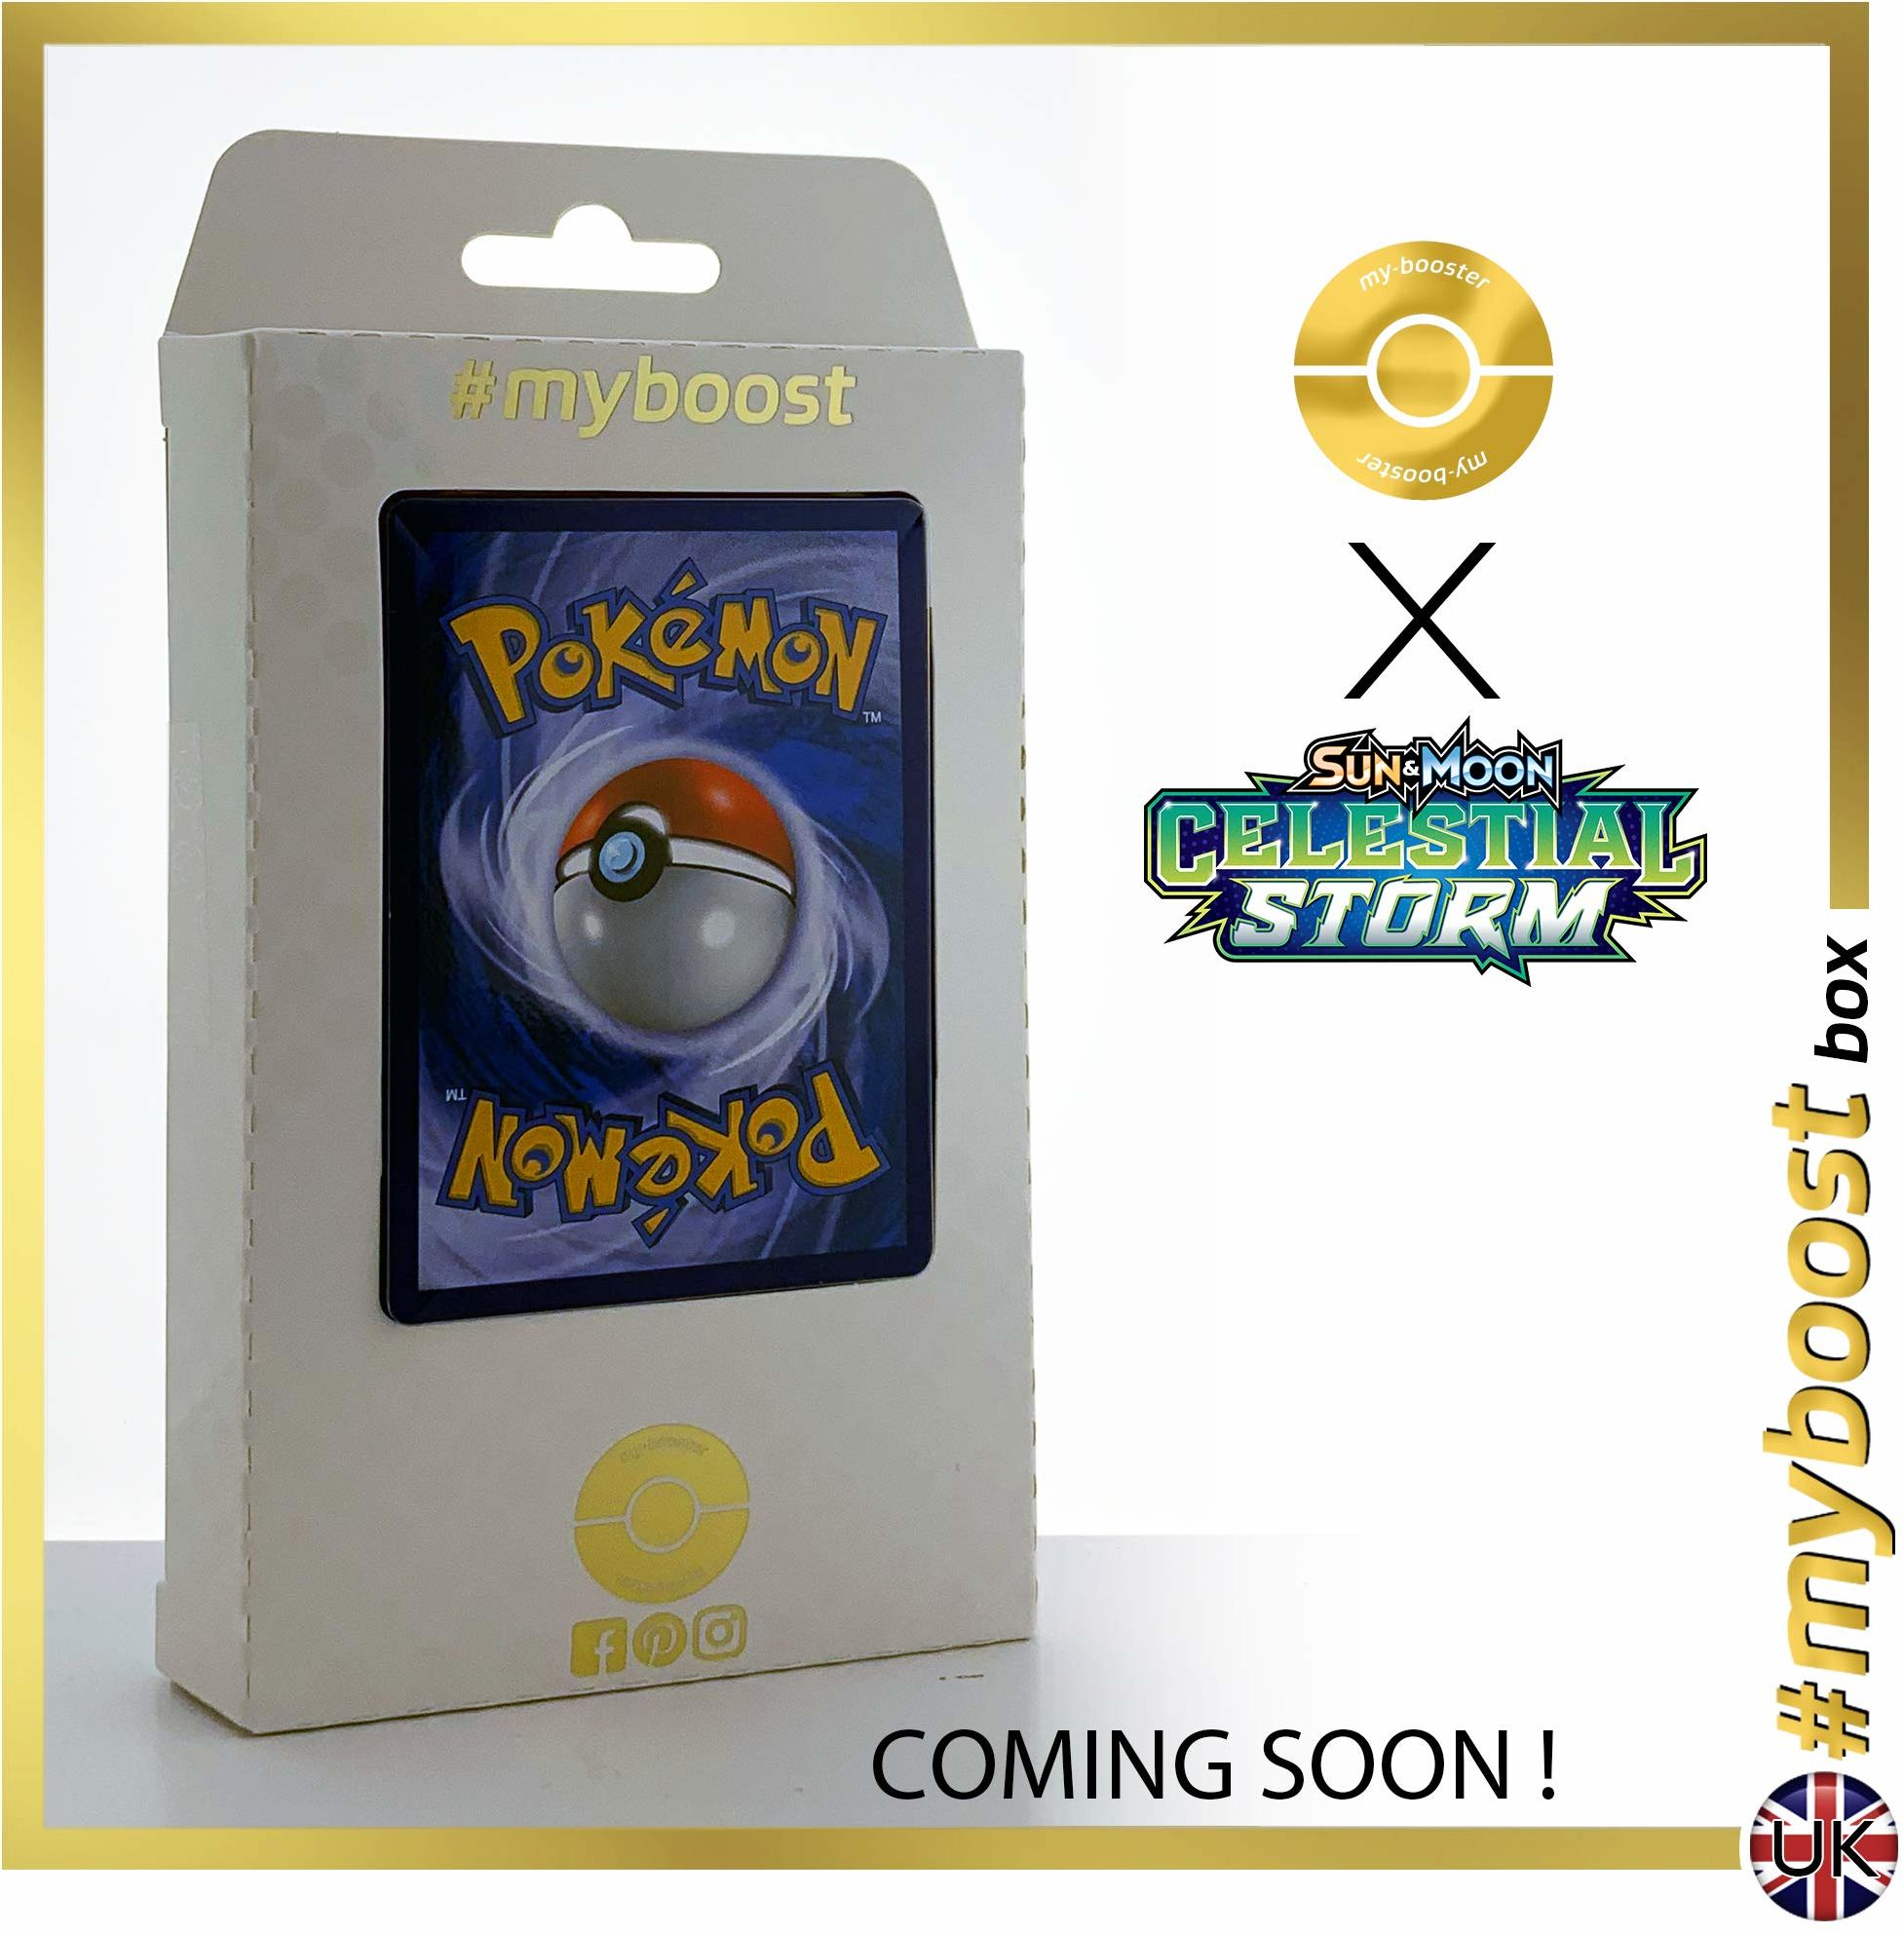 Deoxys 67/168 Holo Reverse - #myboost X Sun & Moon 7 Celestrial Storm - Pudełko 10 angielskich kart Pokemon